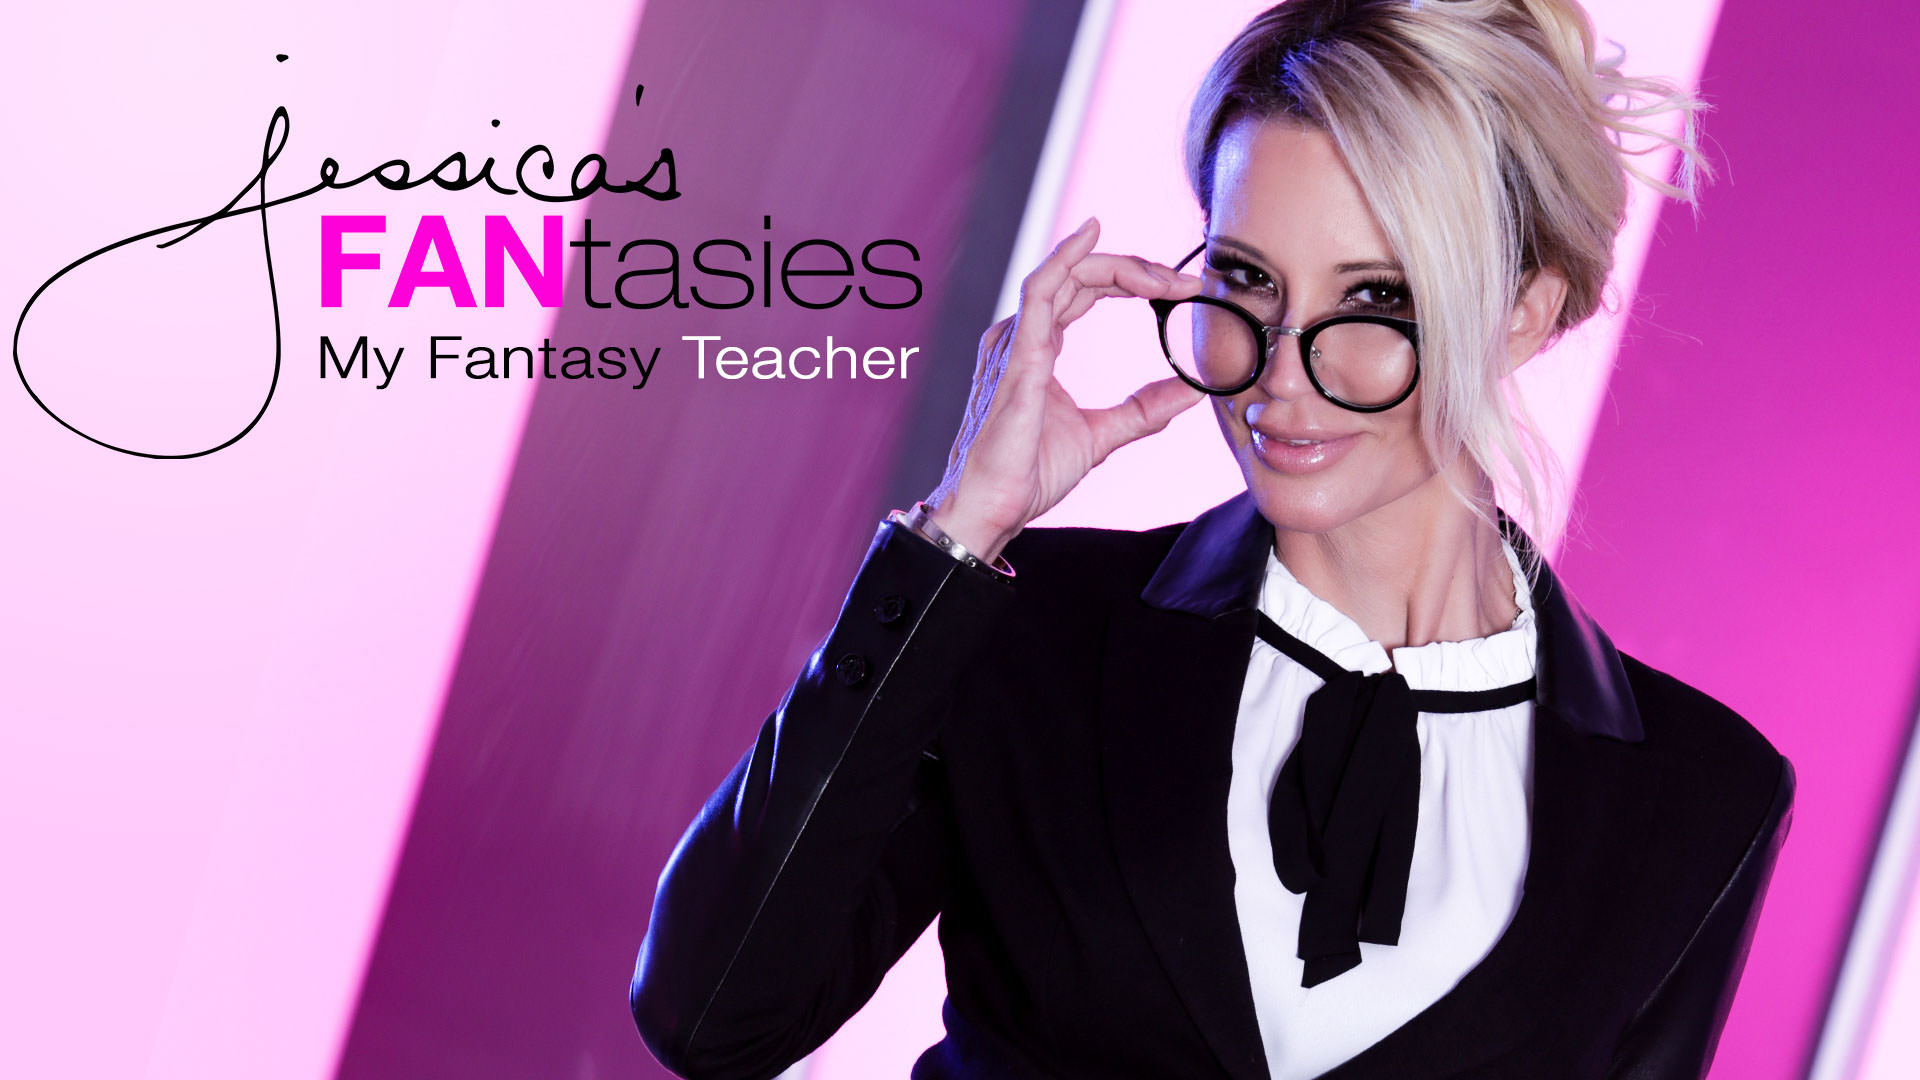 jessica's FANtasies - My Fantasy Teacher